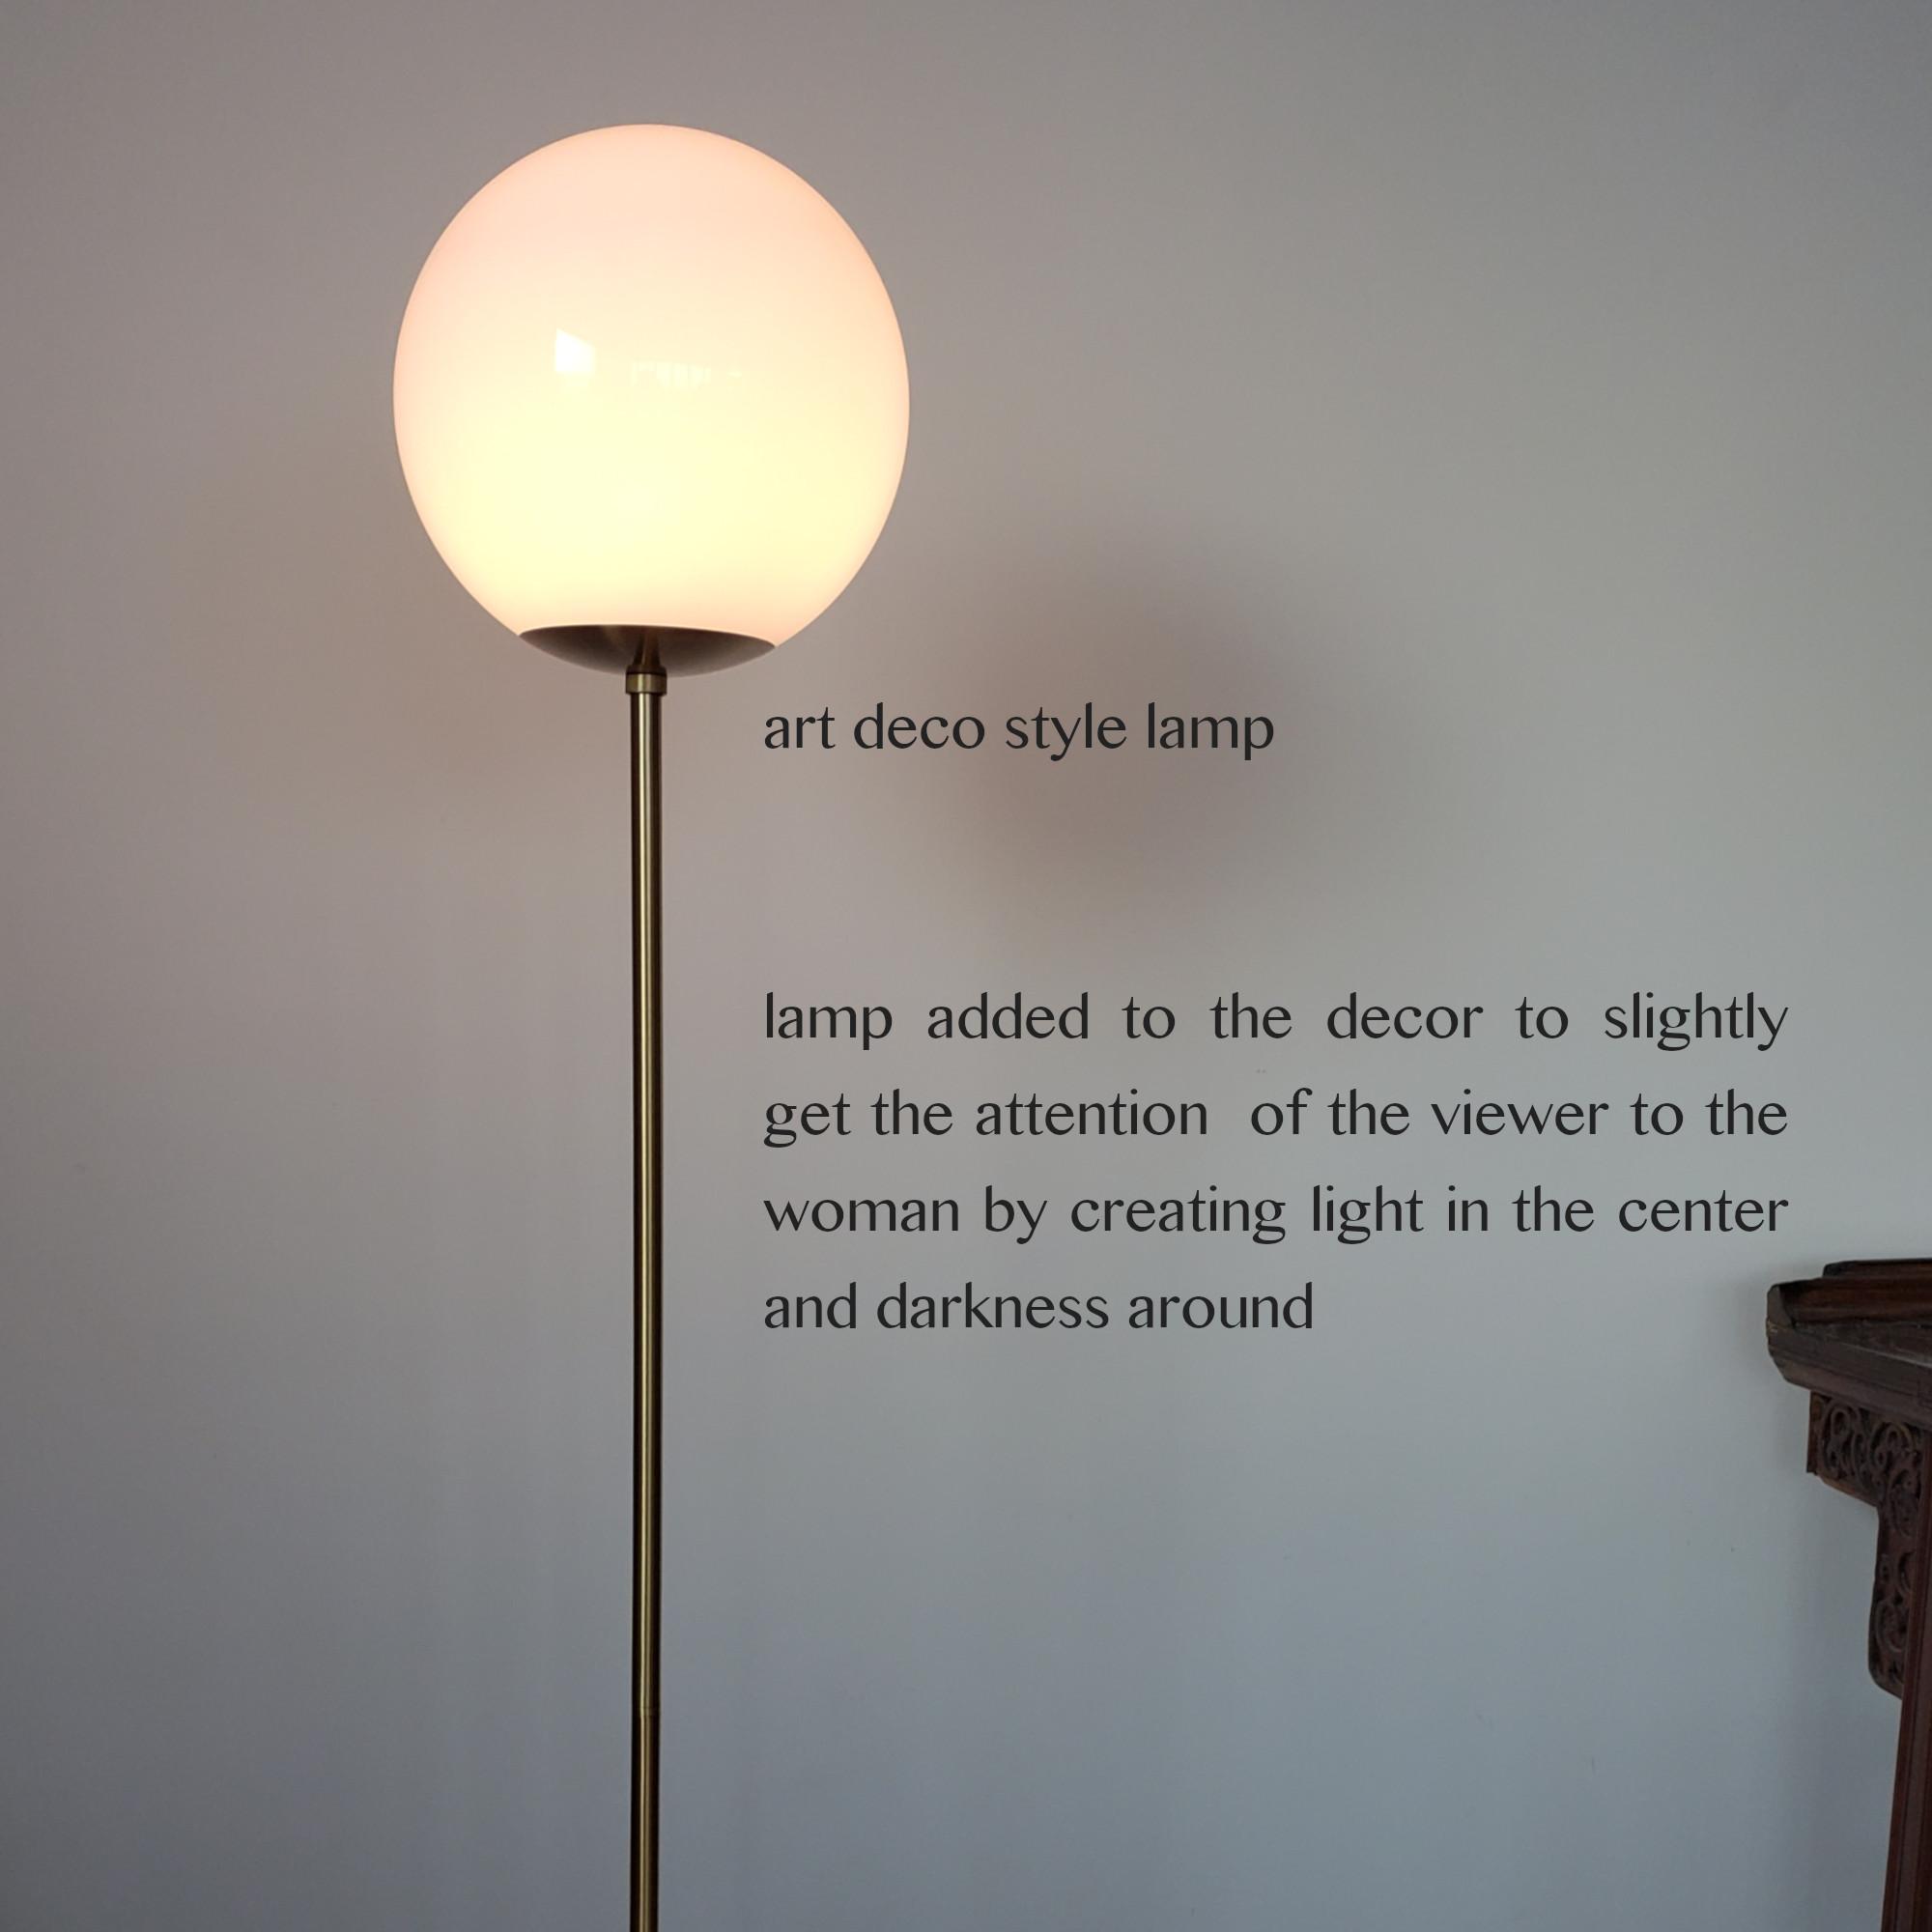 QR code lamp arm right